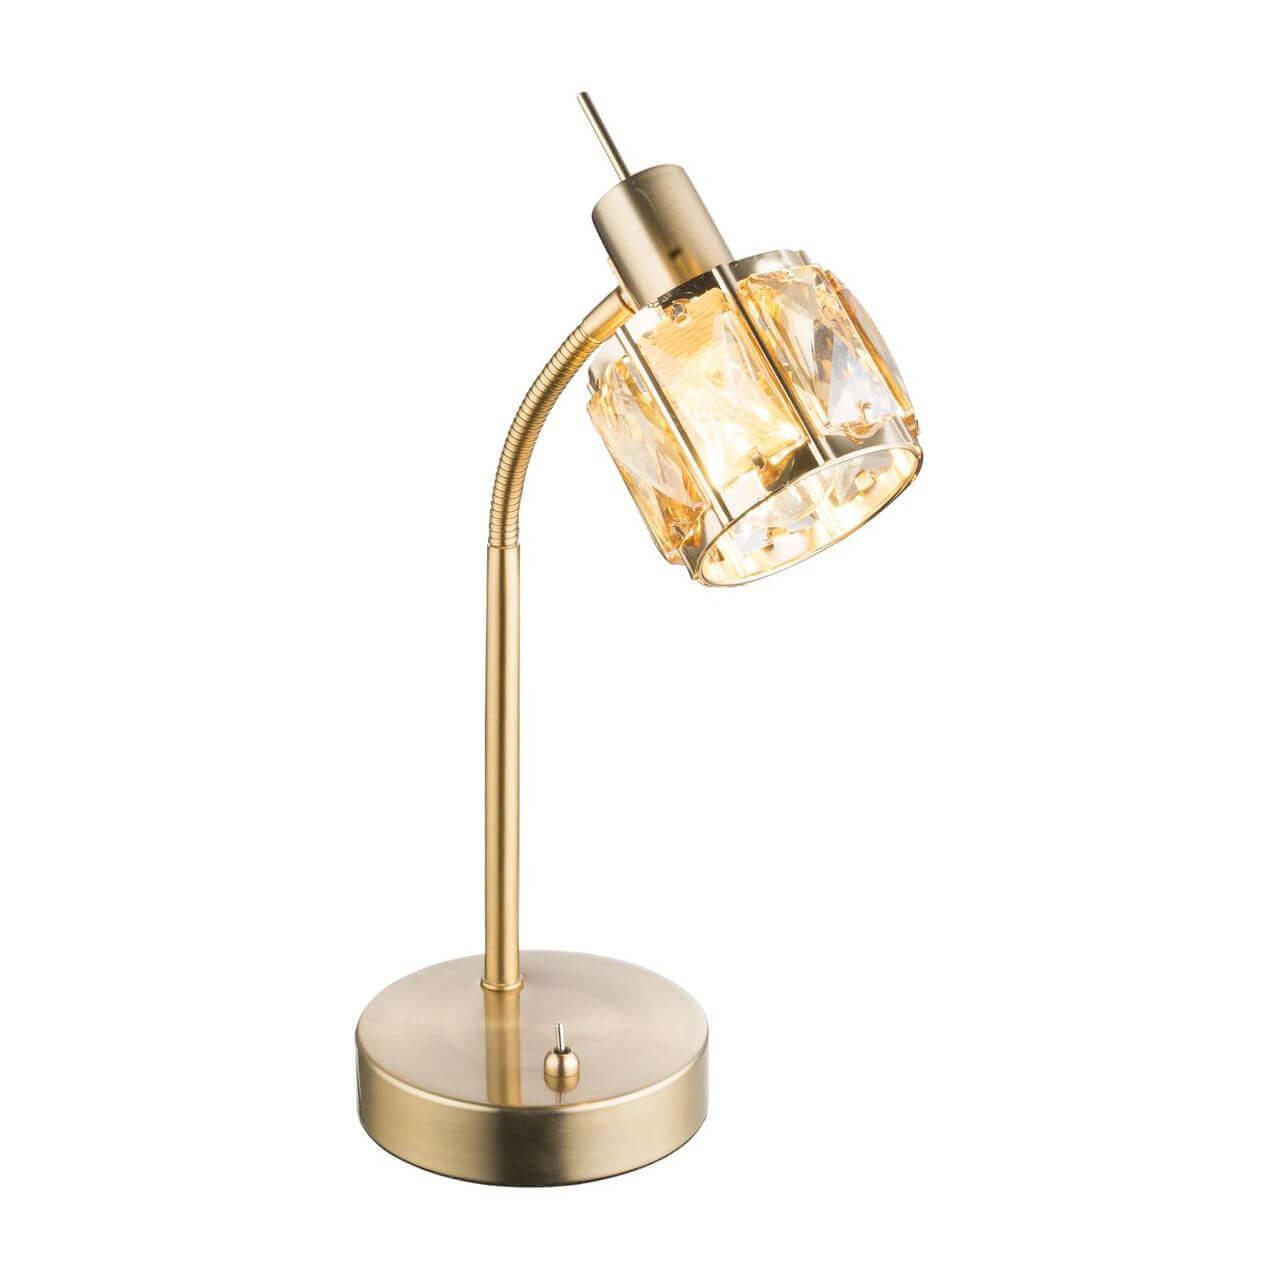 Настольная лампа Globo 54358-1T Mero недорого